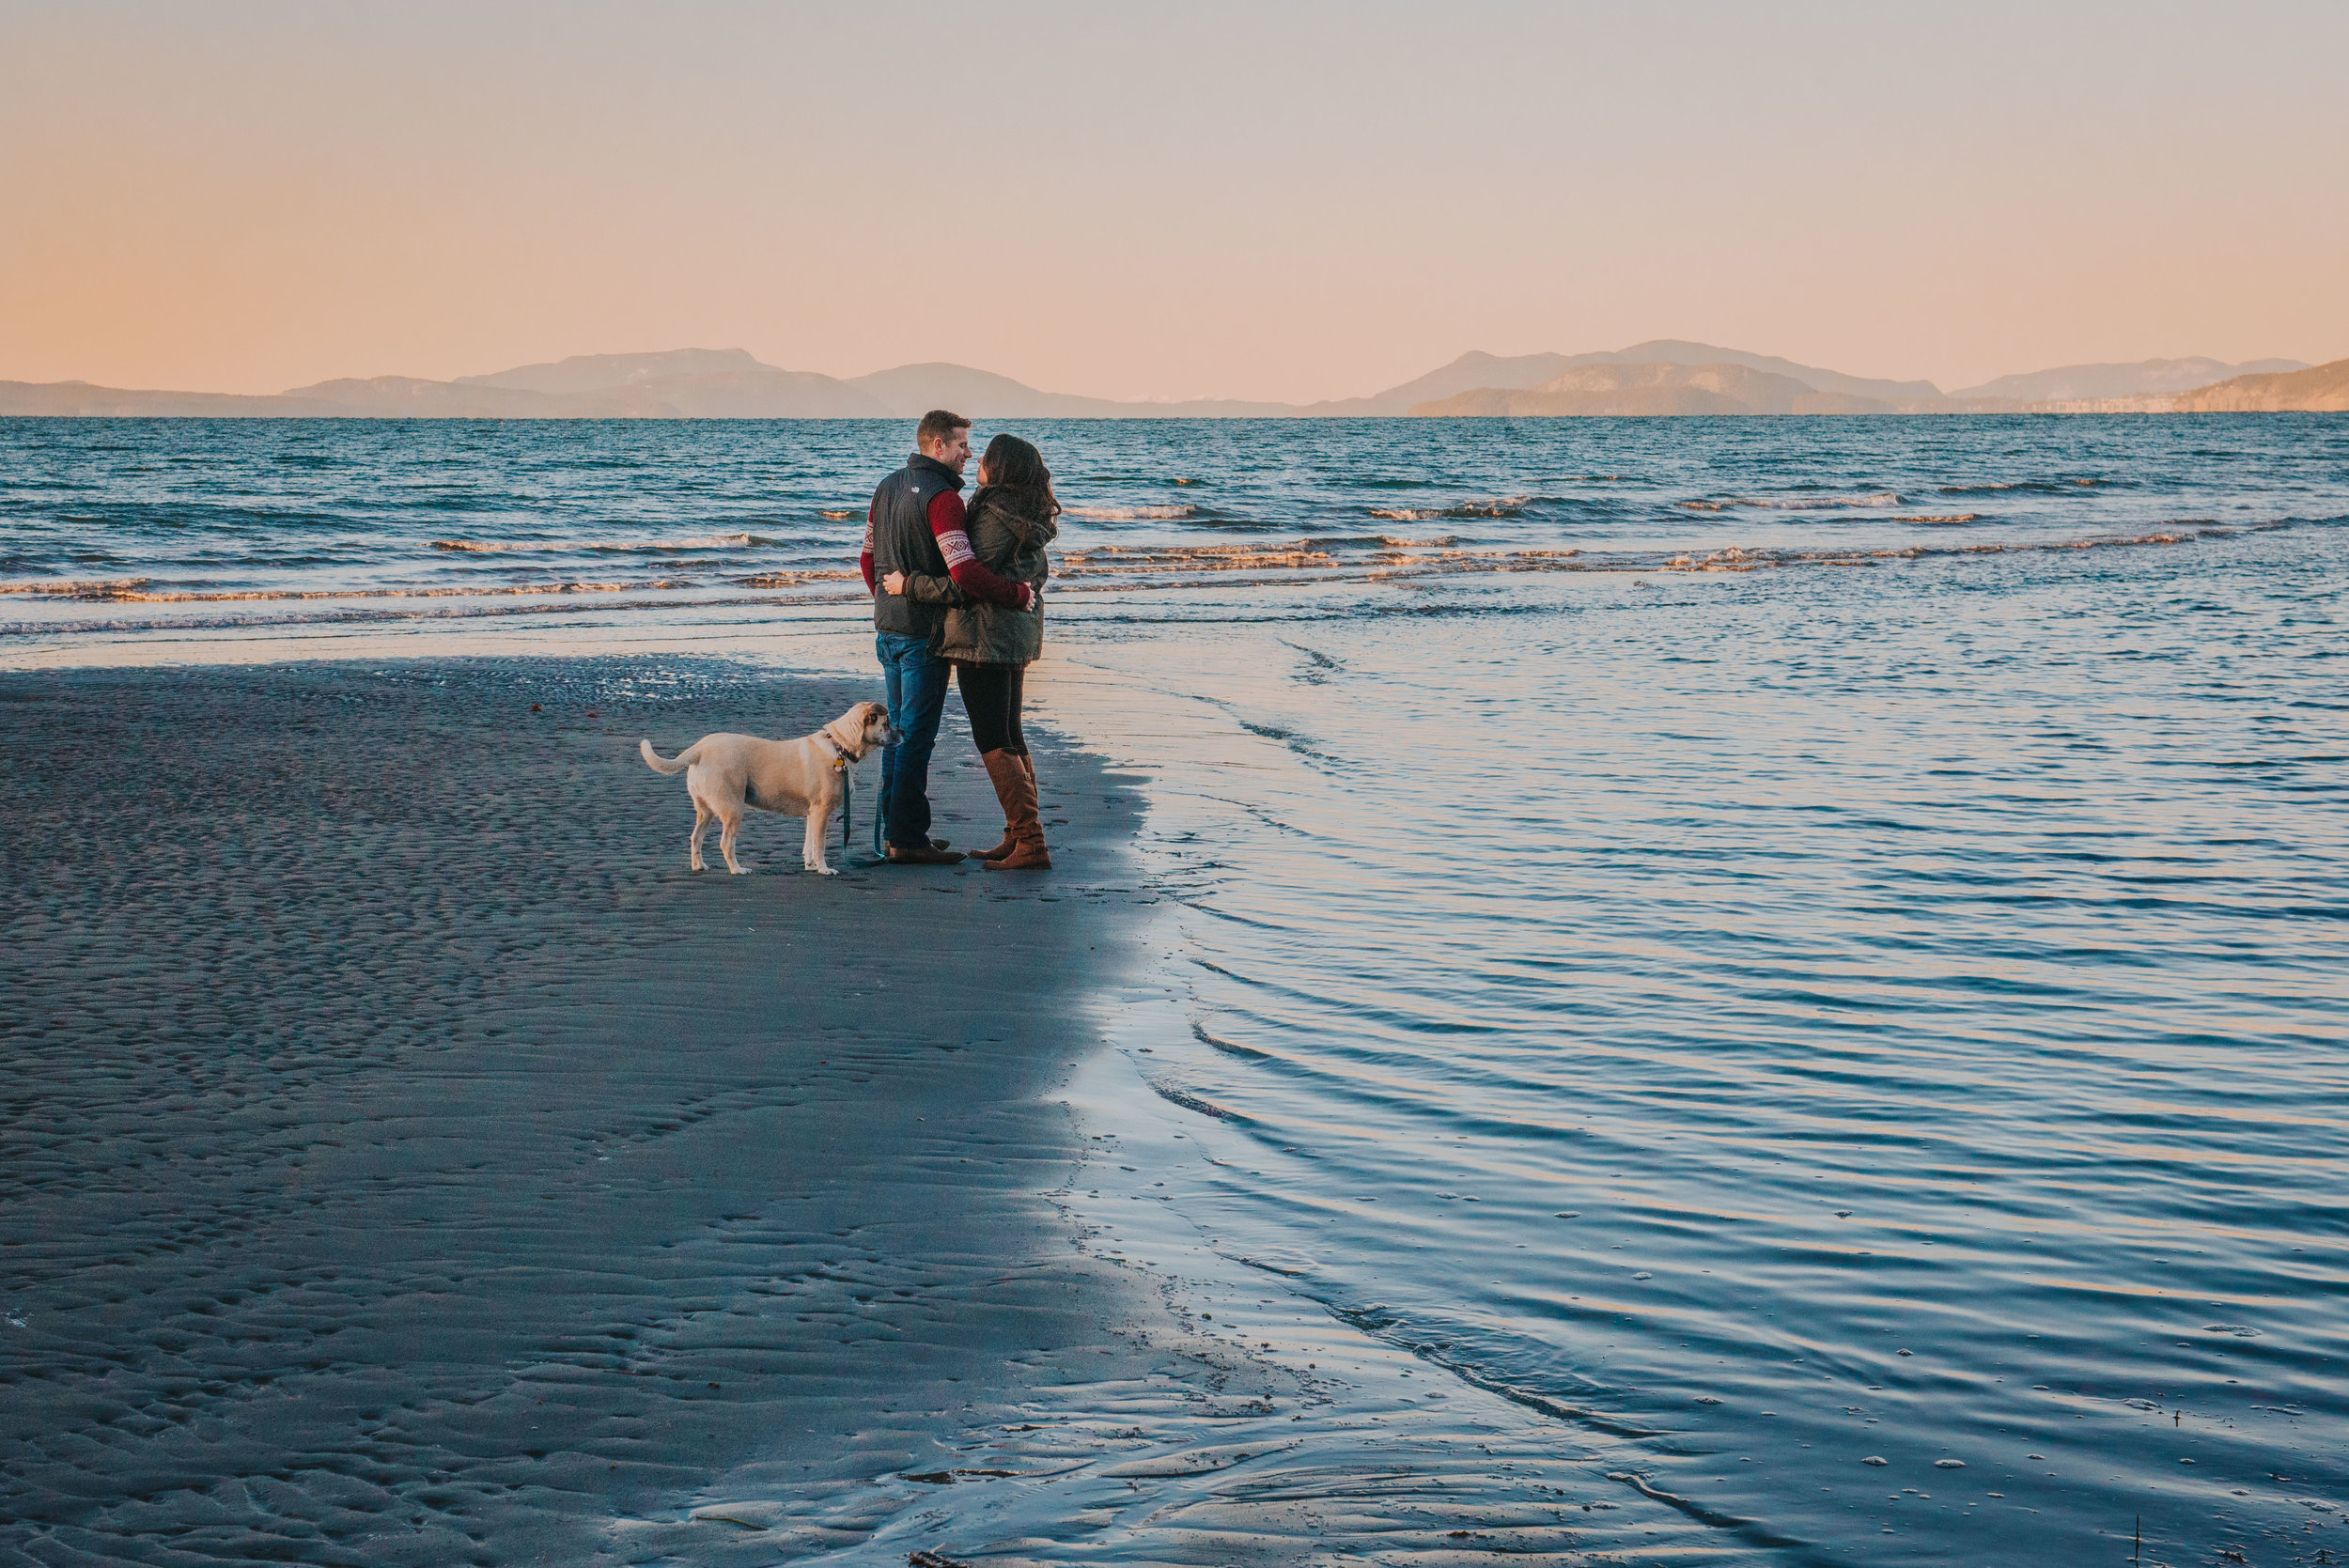 Oak-Harbor-Couples-Photographer (11 of 20).jpg